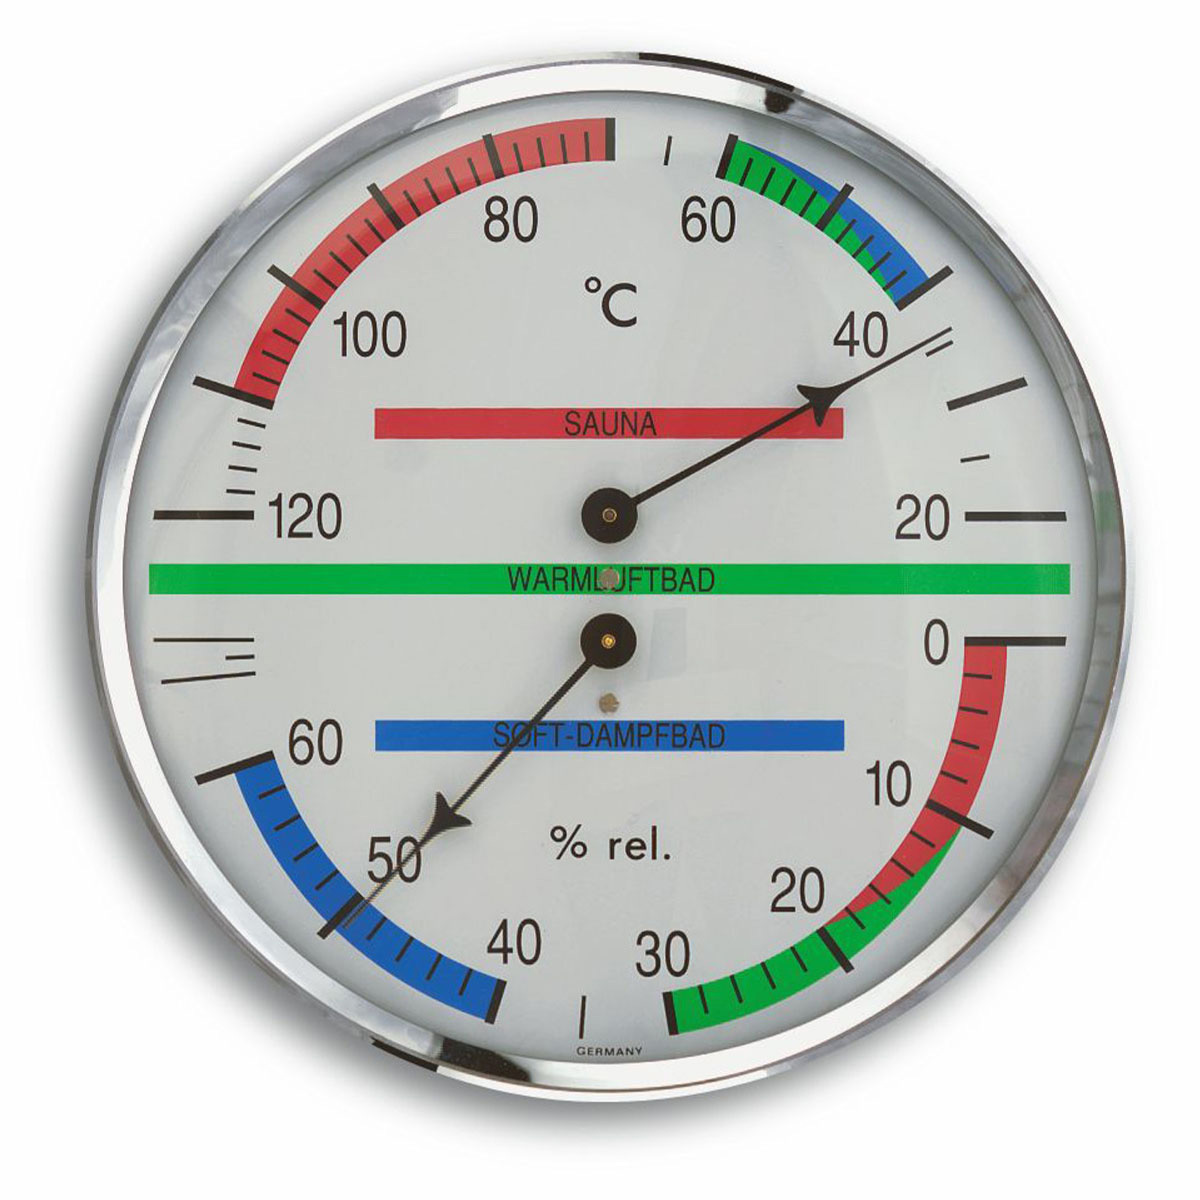 40-1013-analoges-sauna-thermo-hygrometer-mit-metallring-1200x1200px.jpg